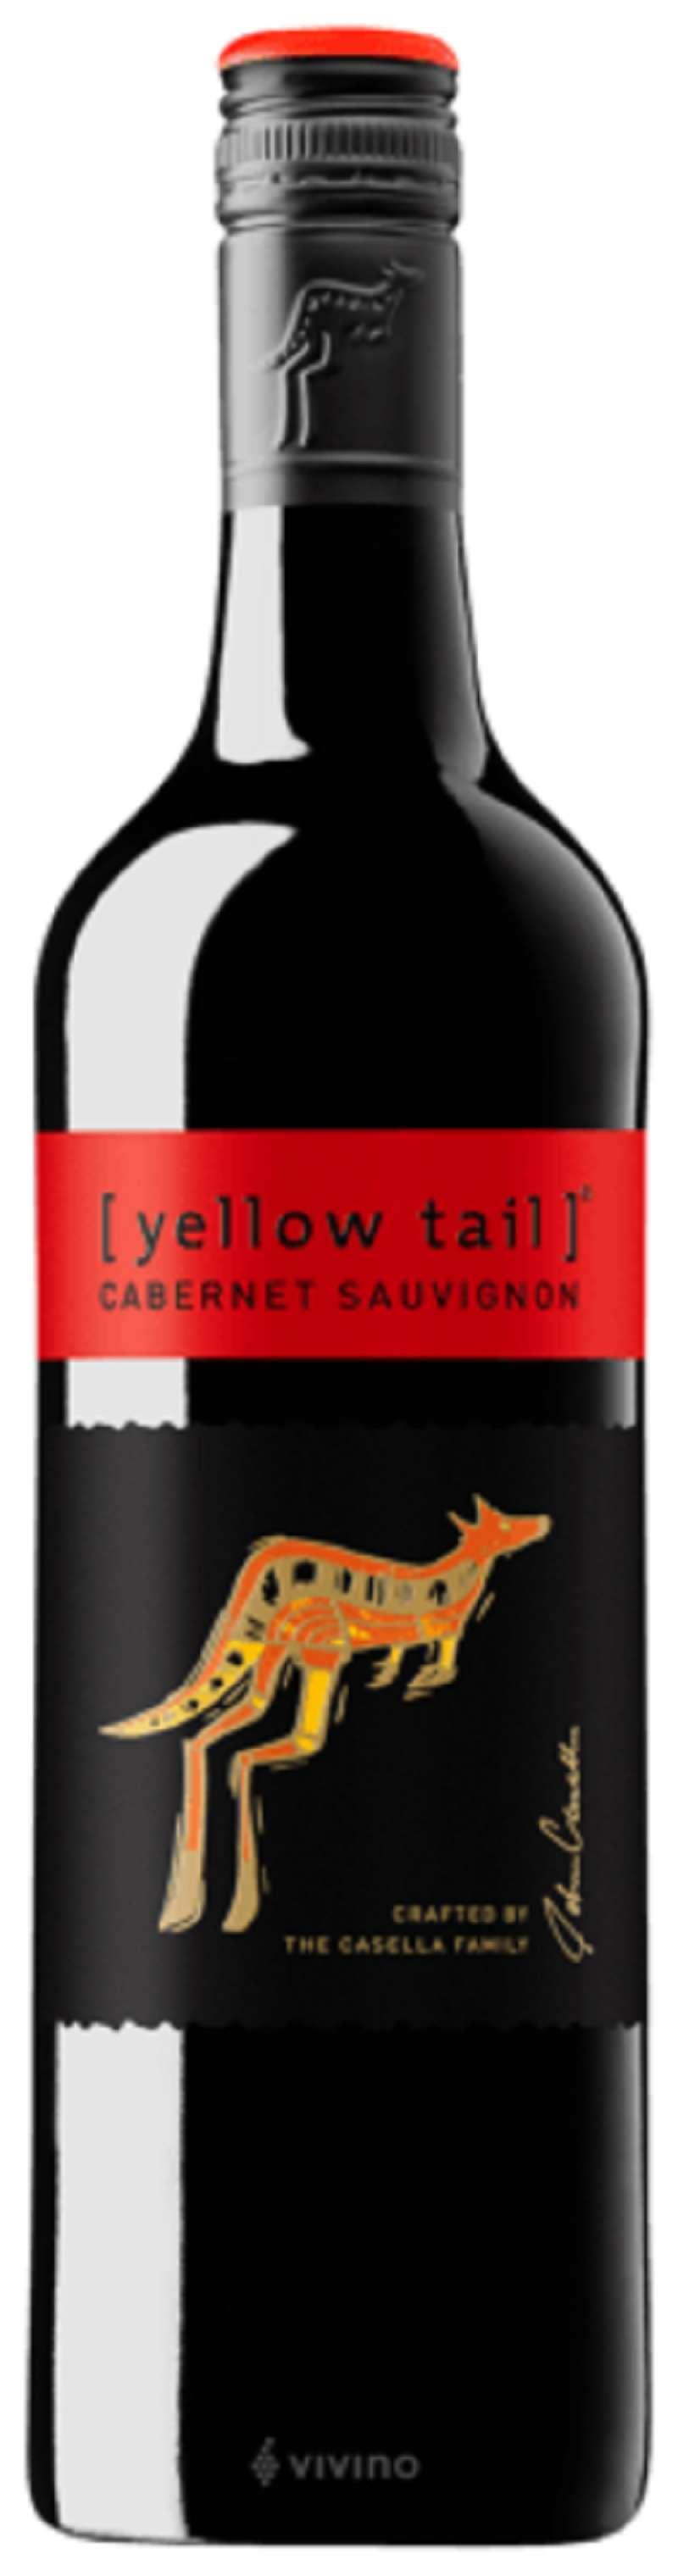 Jual Yellow Tail Cabernet Sauvignon 750ml 13 5 Online November 2020 Blibli Com